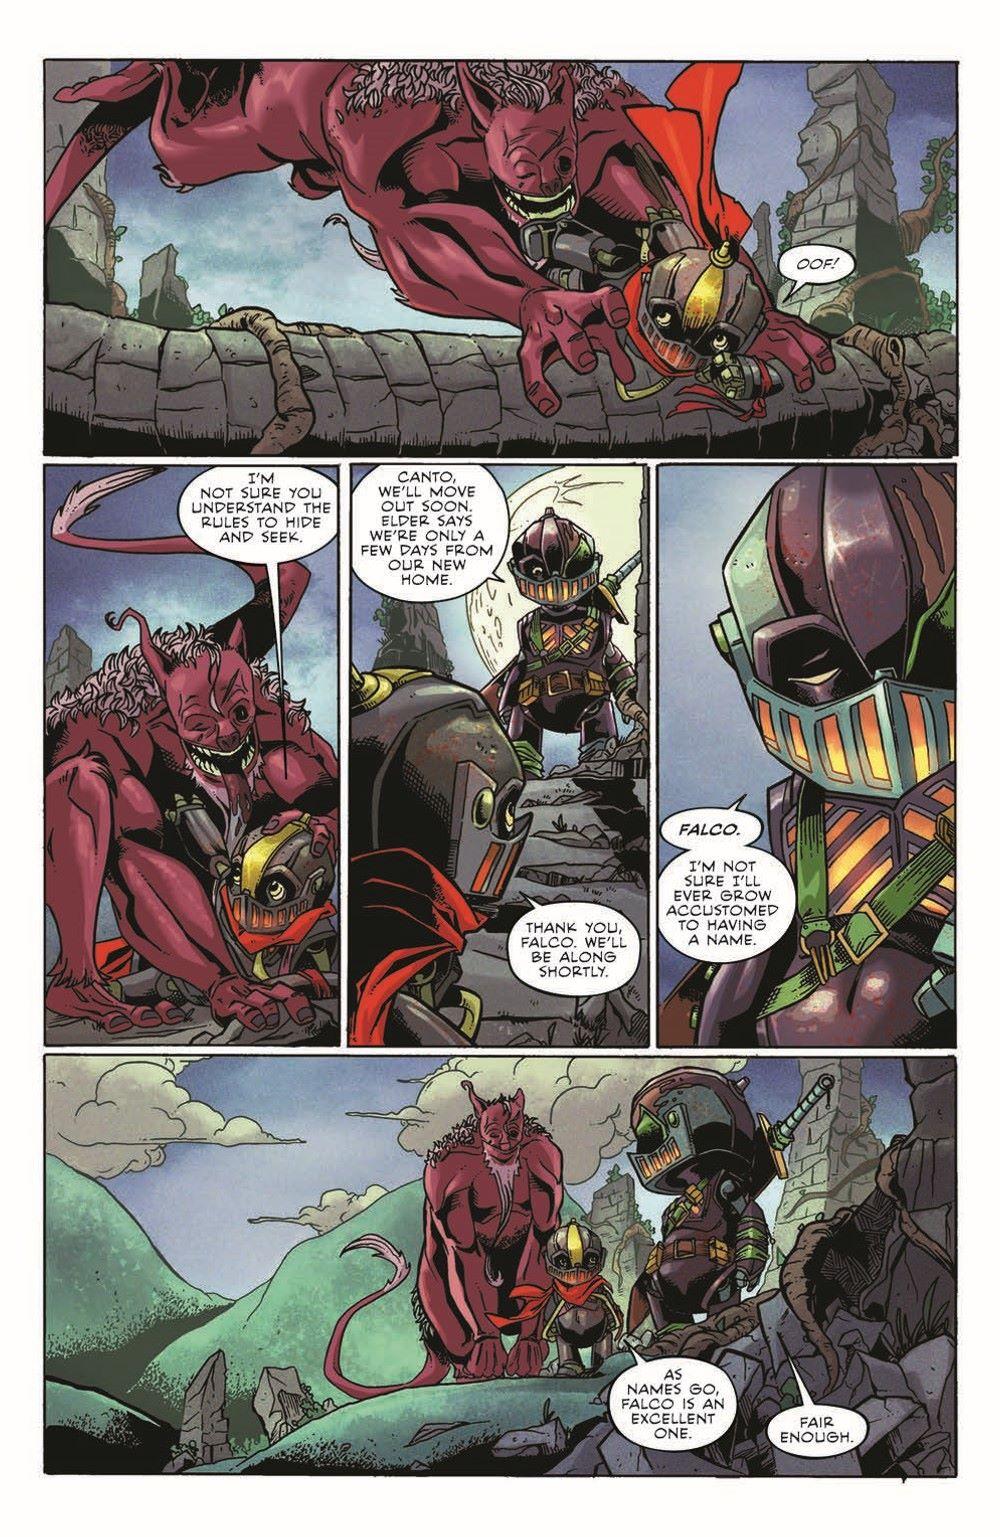 CANTOTPB02_pr-6 ComicList Previews: CANTO II THE HOLLOW MEN TP